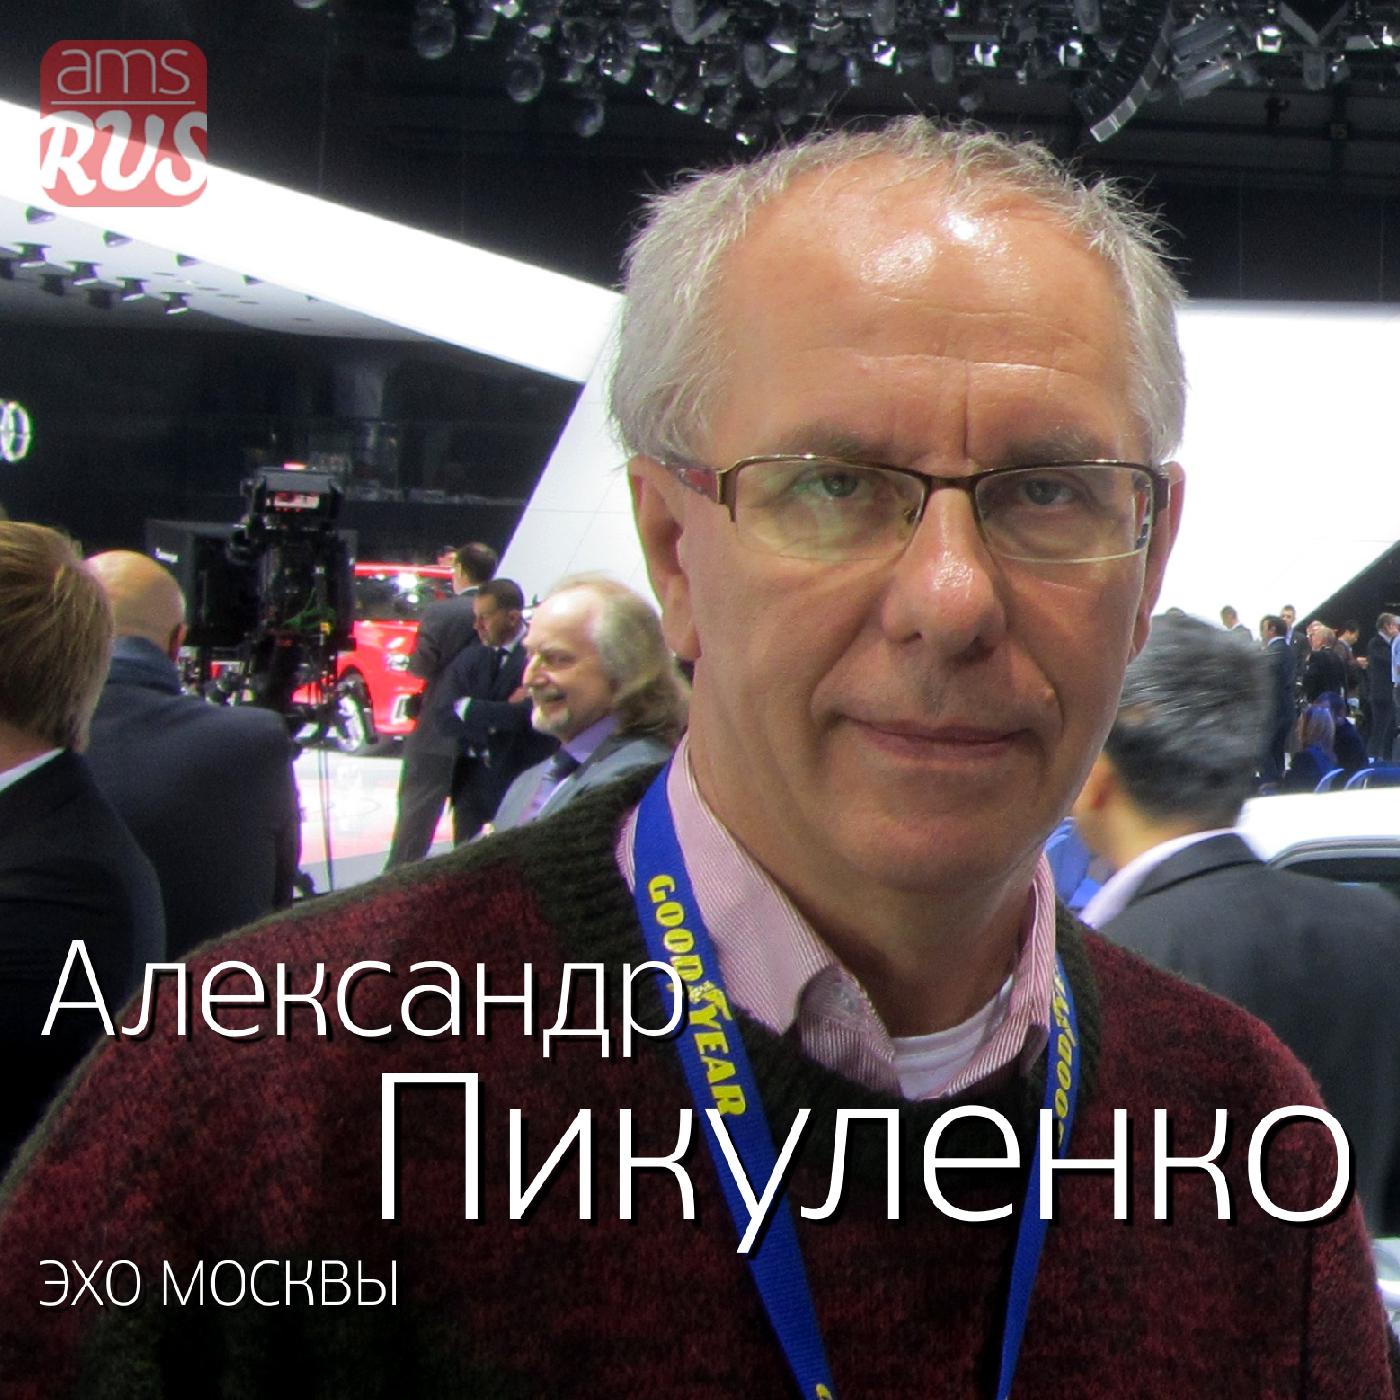 Александр Пикуленко на Эхо Москвы